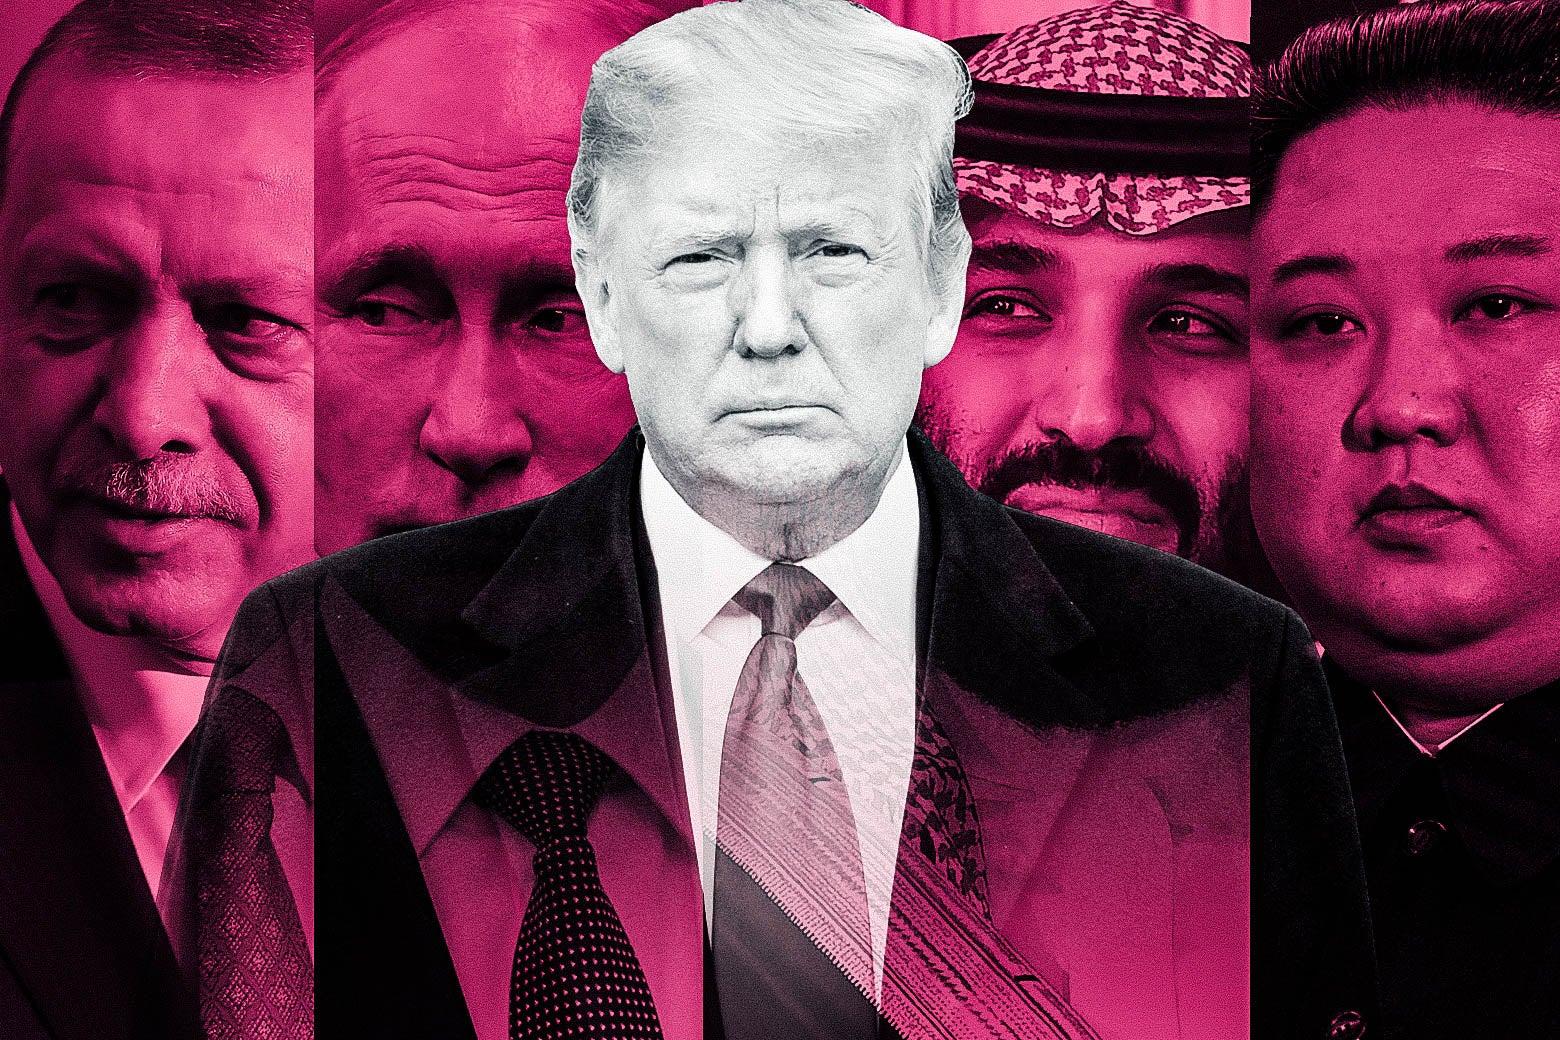 Donald Trump flanked by photos of Recep Tayyip Erdogan, Vladimir Putin, Mohammed bin Salman, and Kim Jong-un.